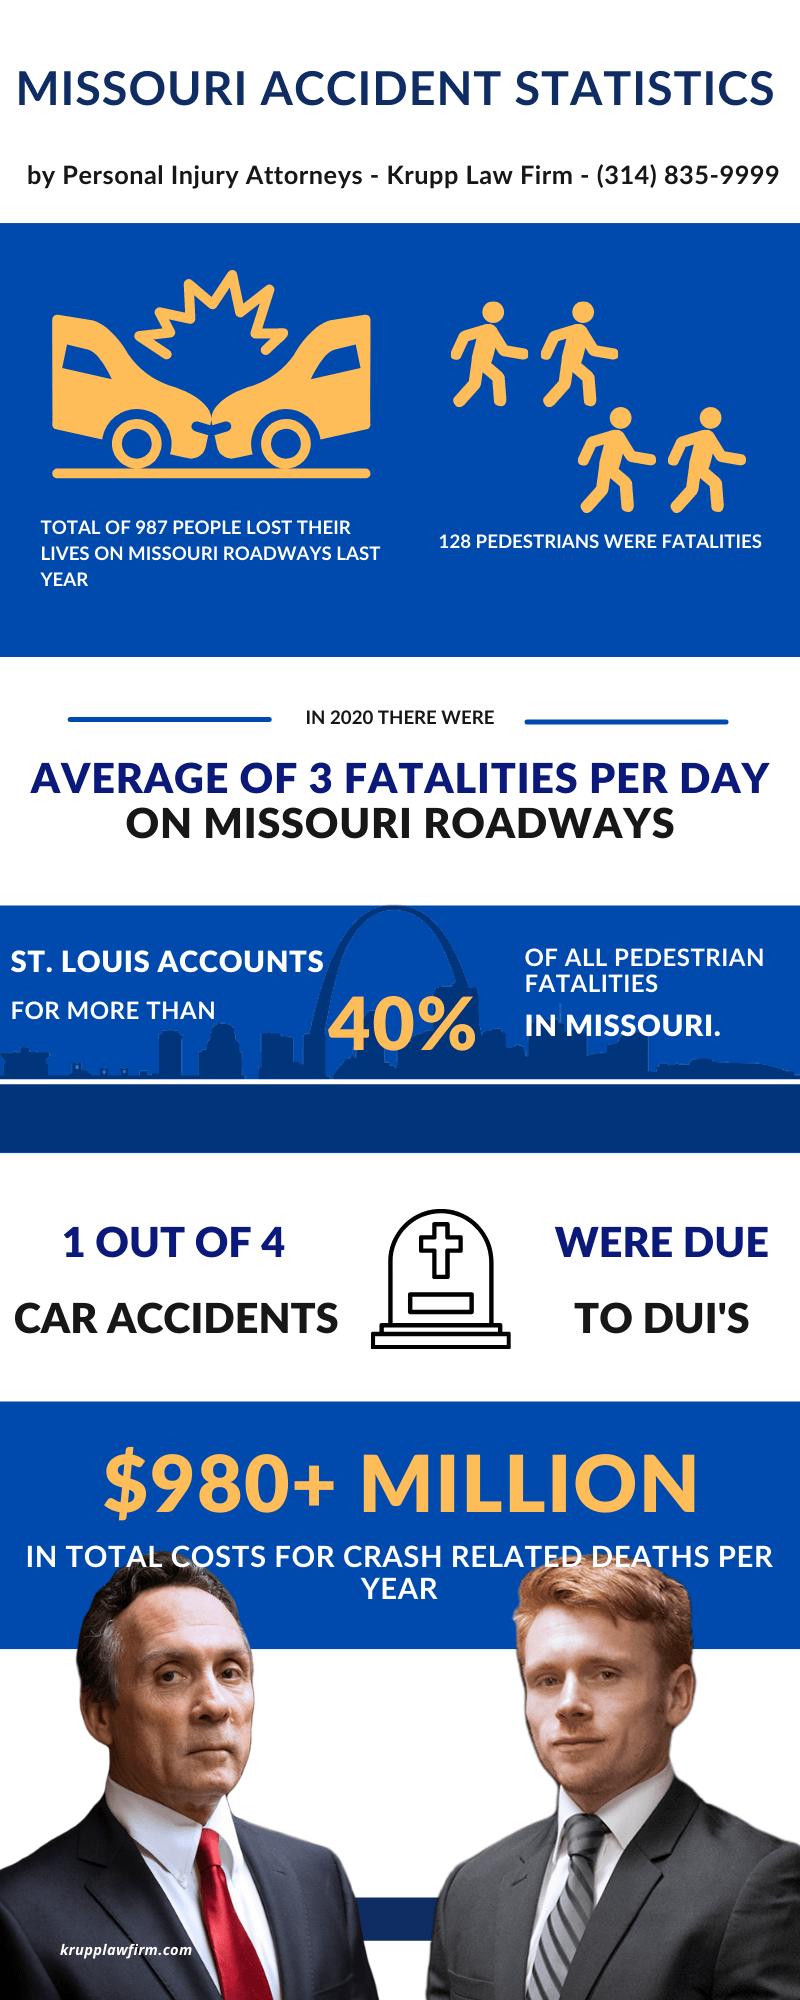 car accident statistics for Missouri infographic